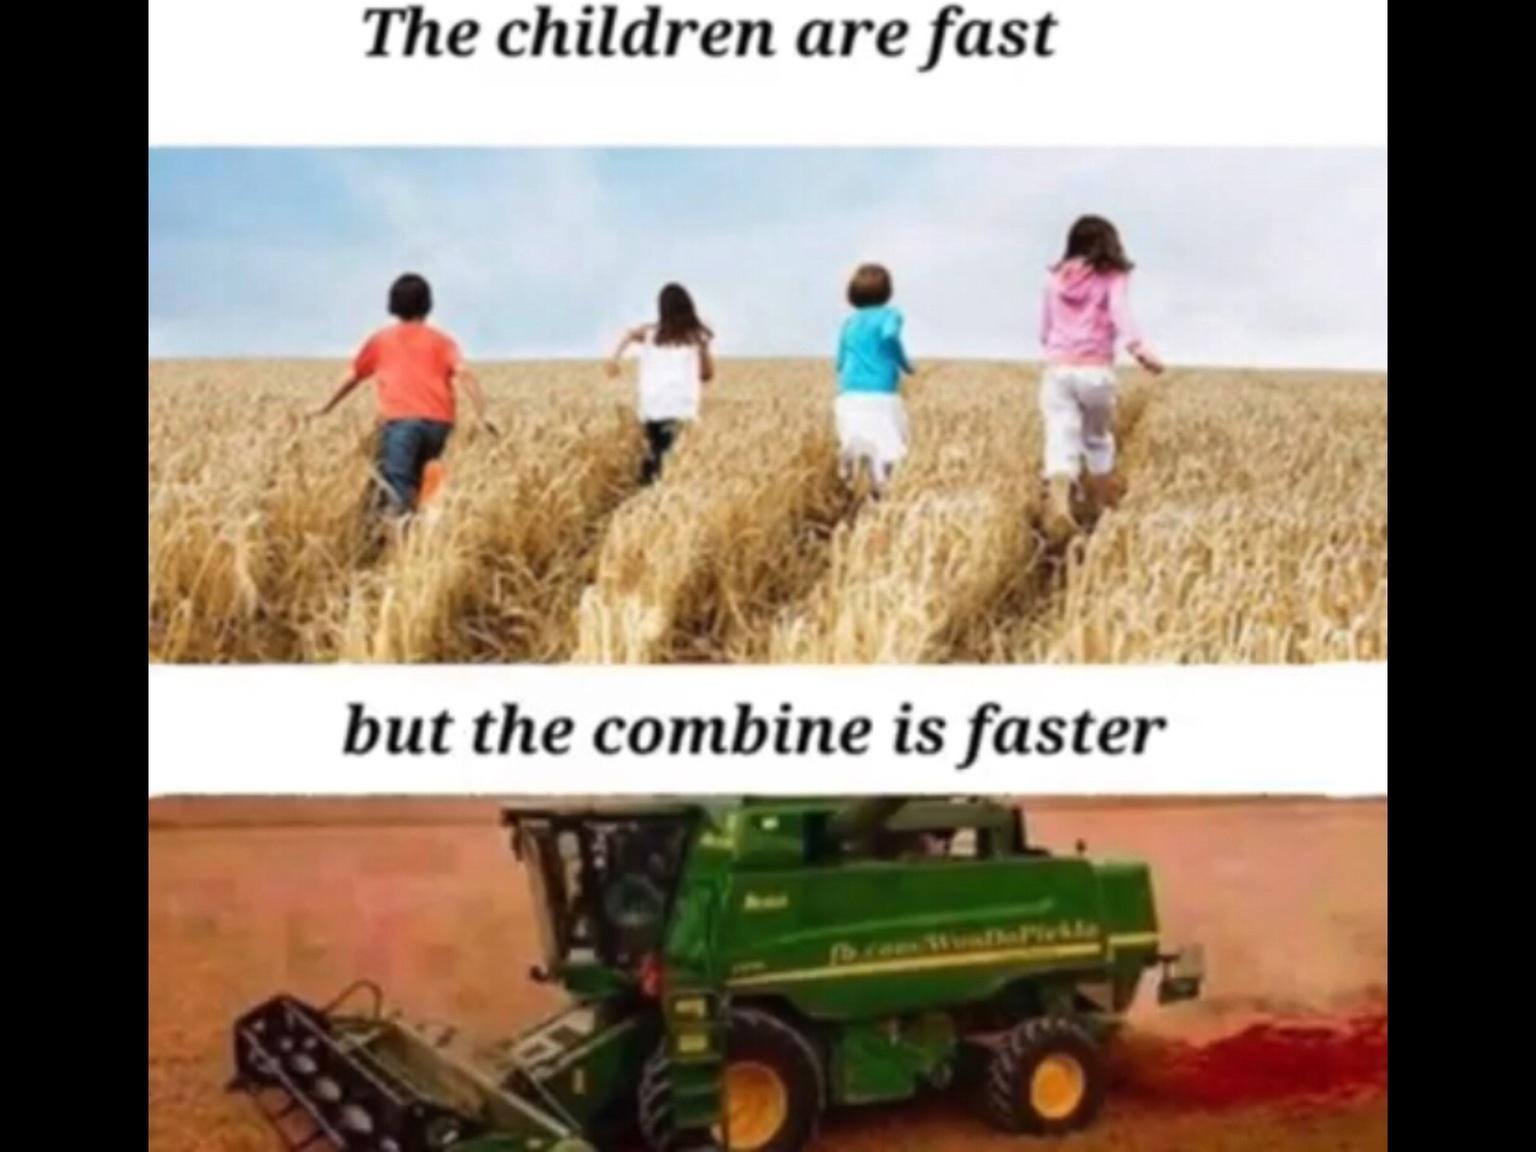 Can't run - meme